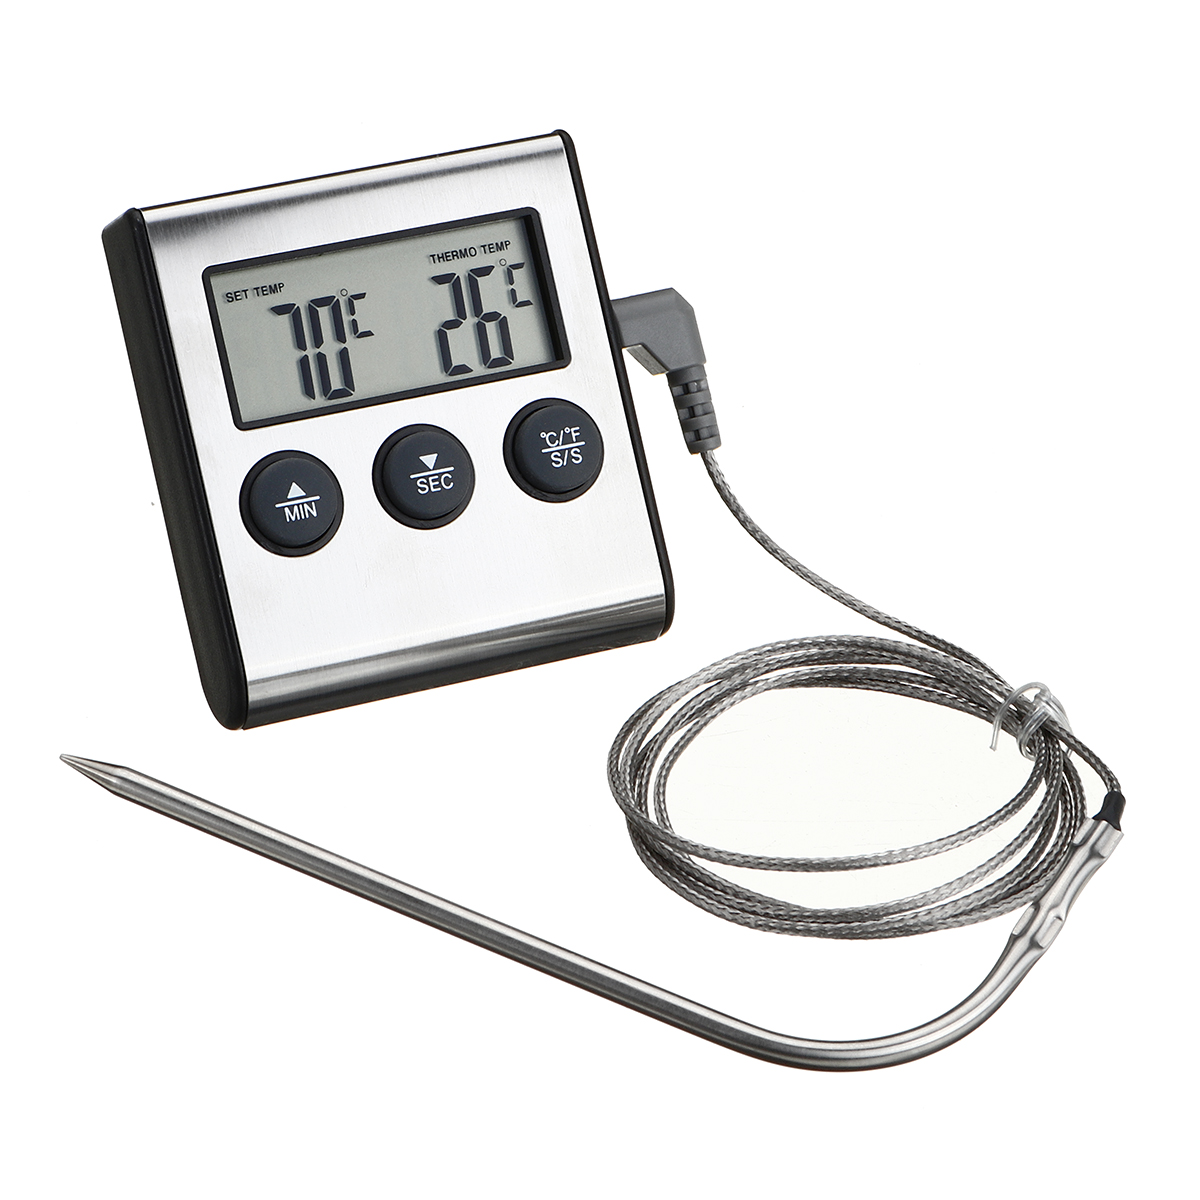 Термометр Кухня Приготовление пищи Мясо Барбекю Зонд Термометр Приготовление пищи Набор